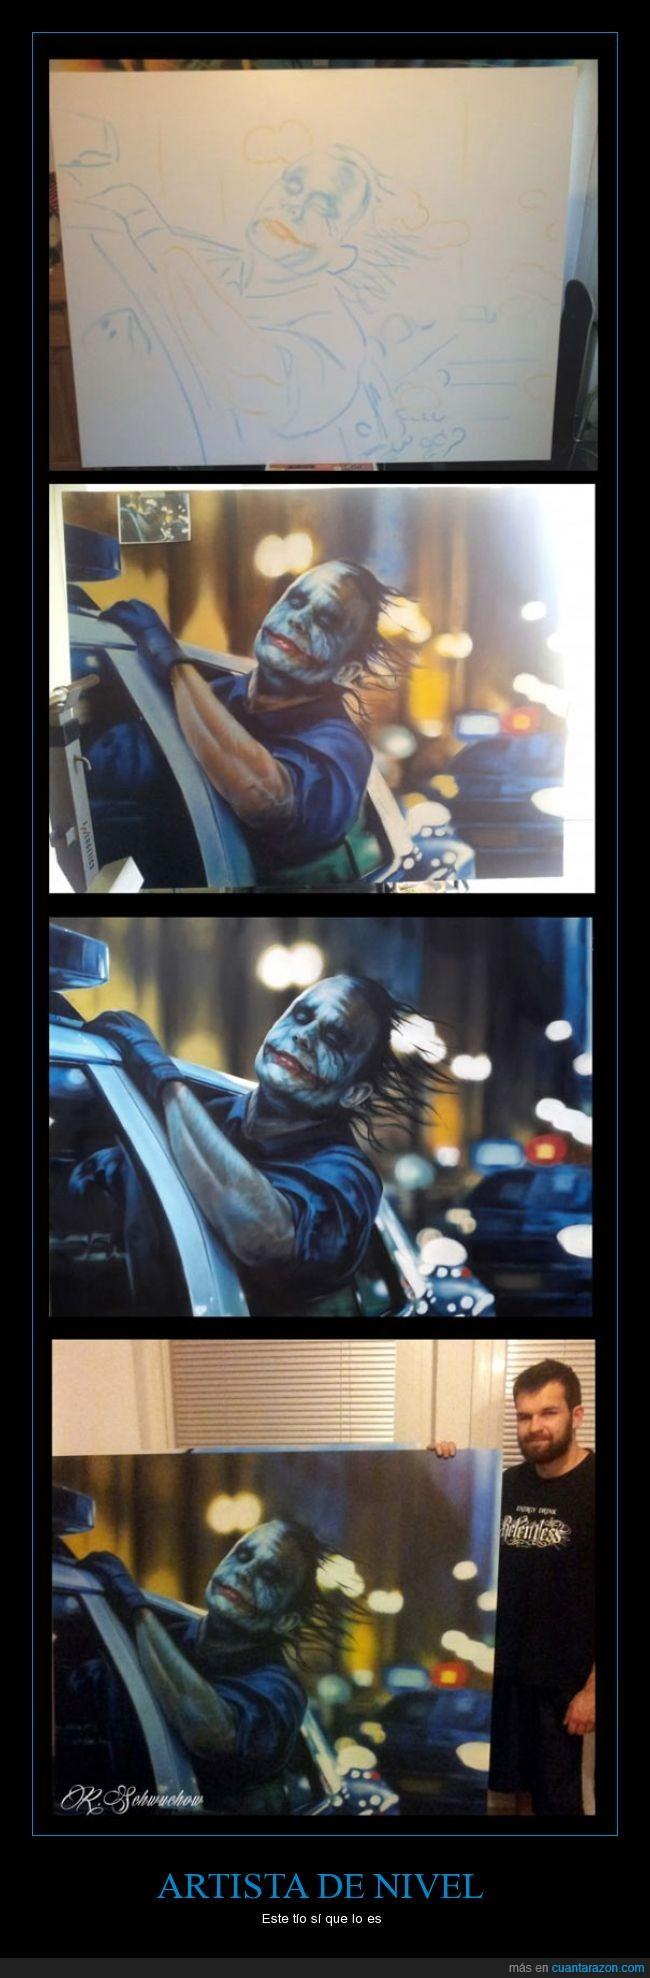 artista,batman,de nivel,fotograma,Joker,lienzo,pintar,pintura,realista